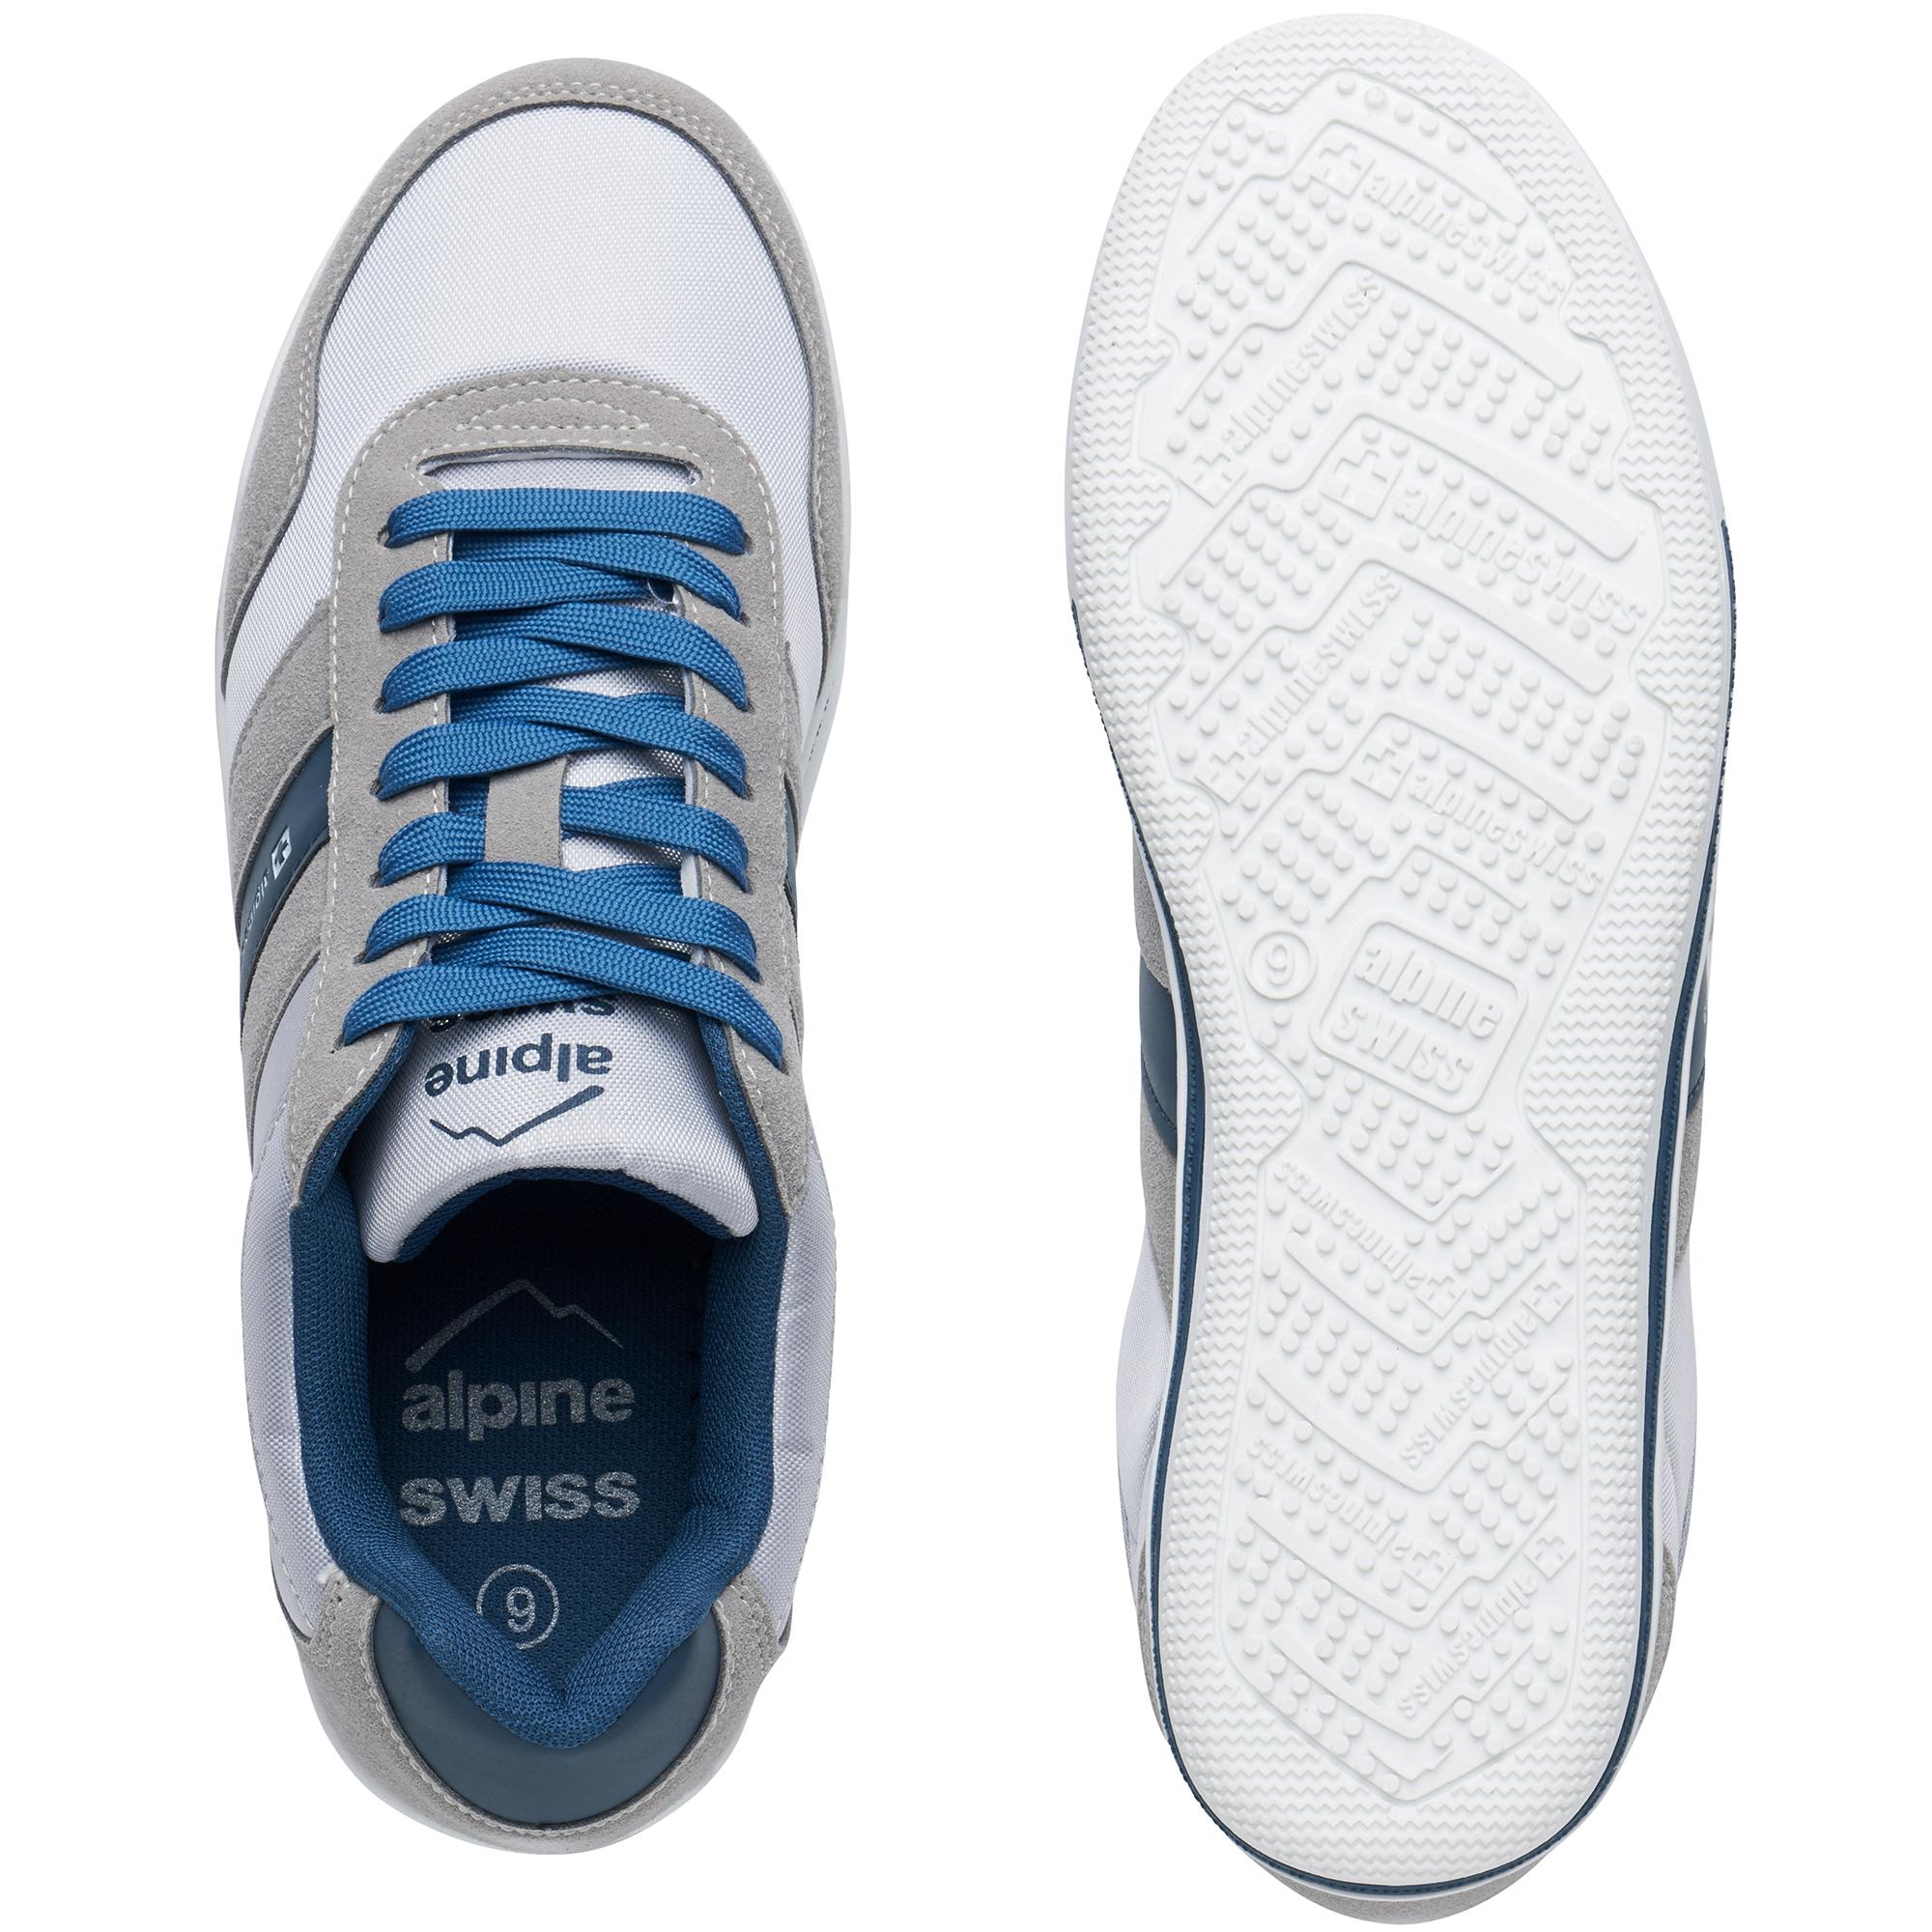 Alpine-Swiss-Haris-Mens-Retro-Striped-Athletic-Shoes-Fashion-Sneaker-Tennis-Shoe thumbnail 11